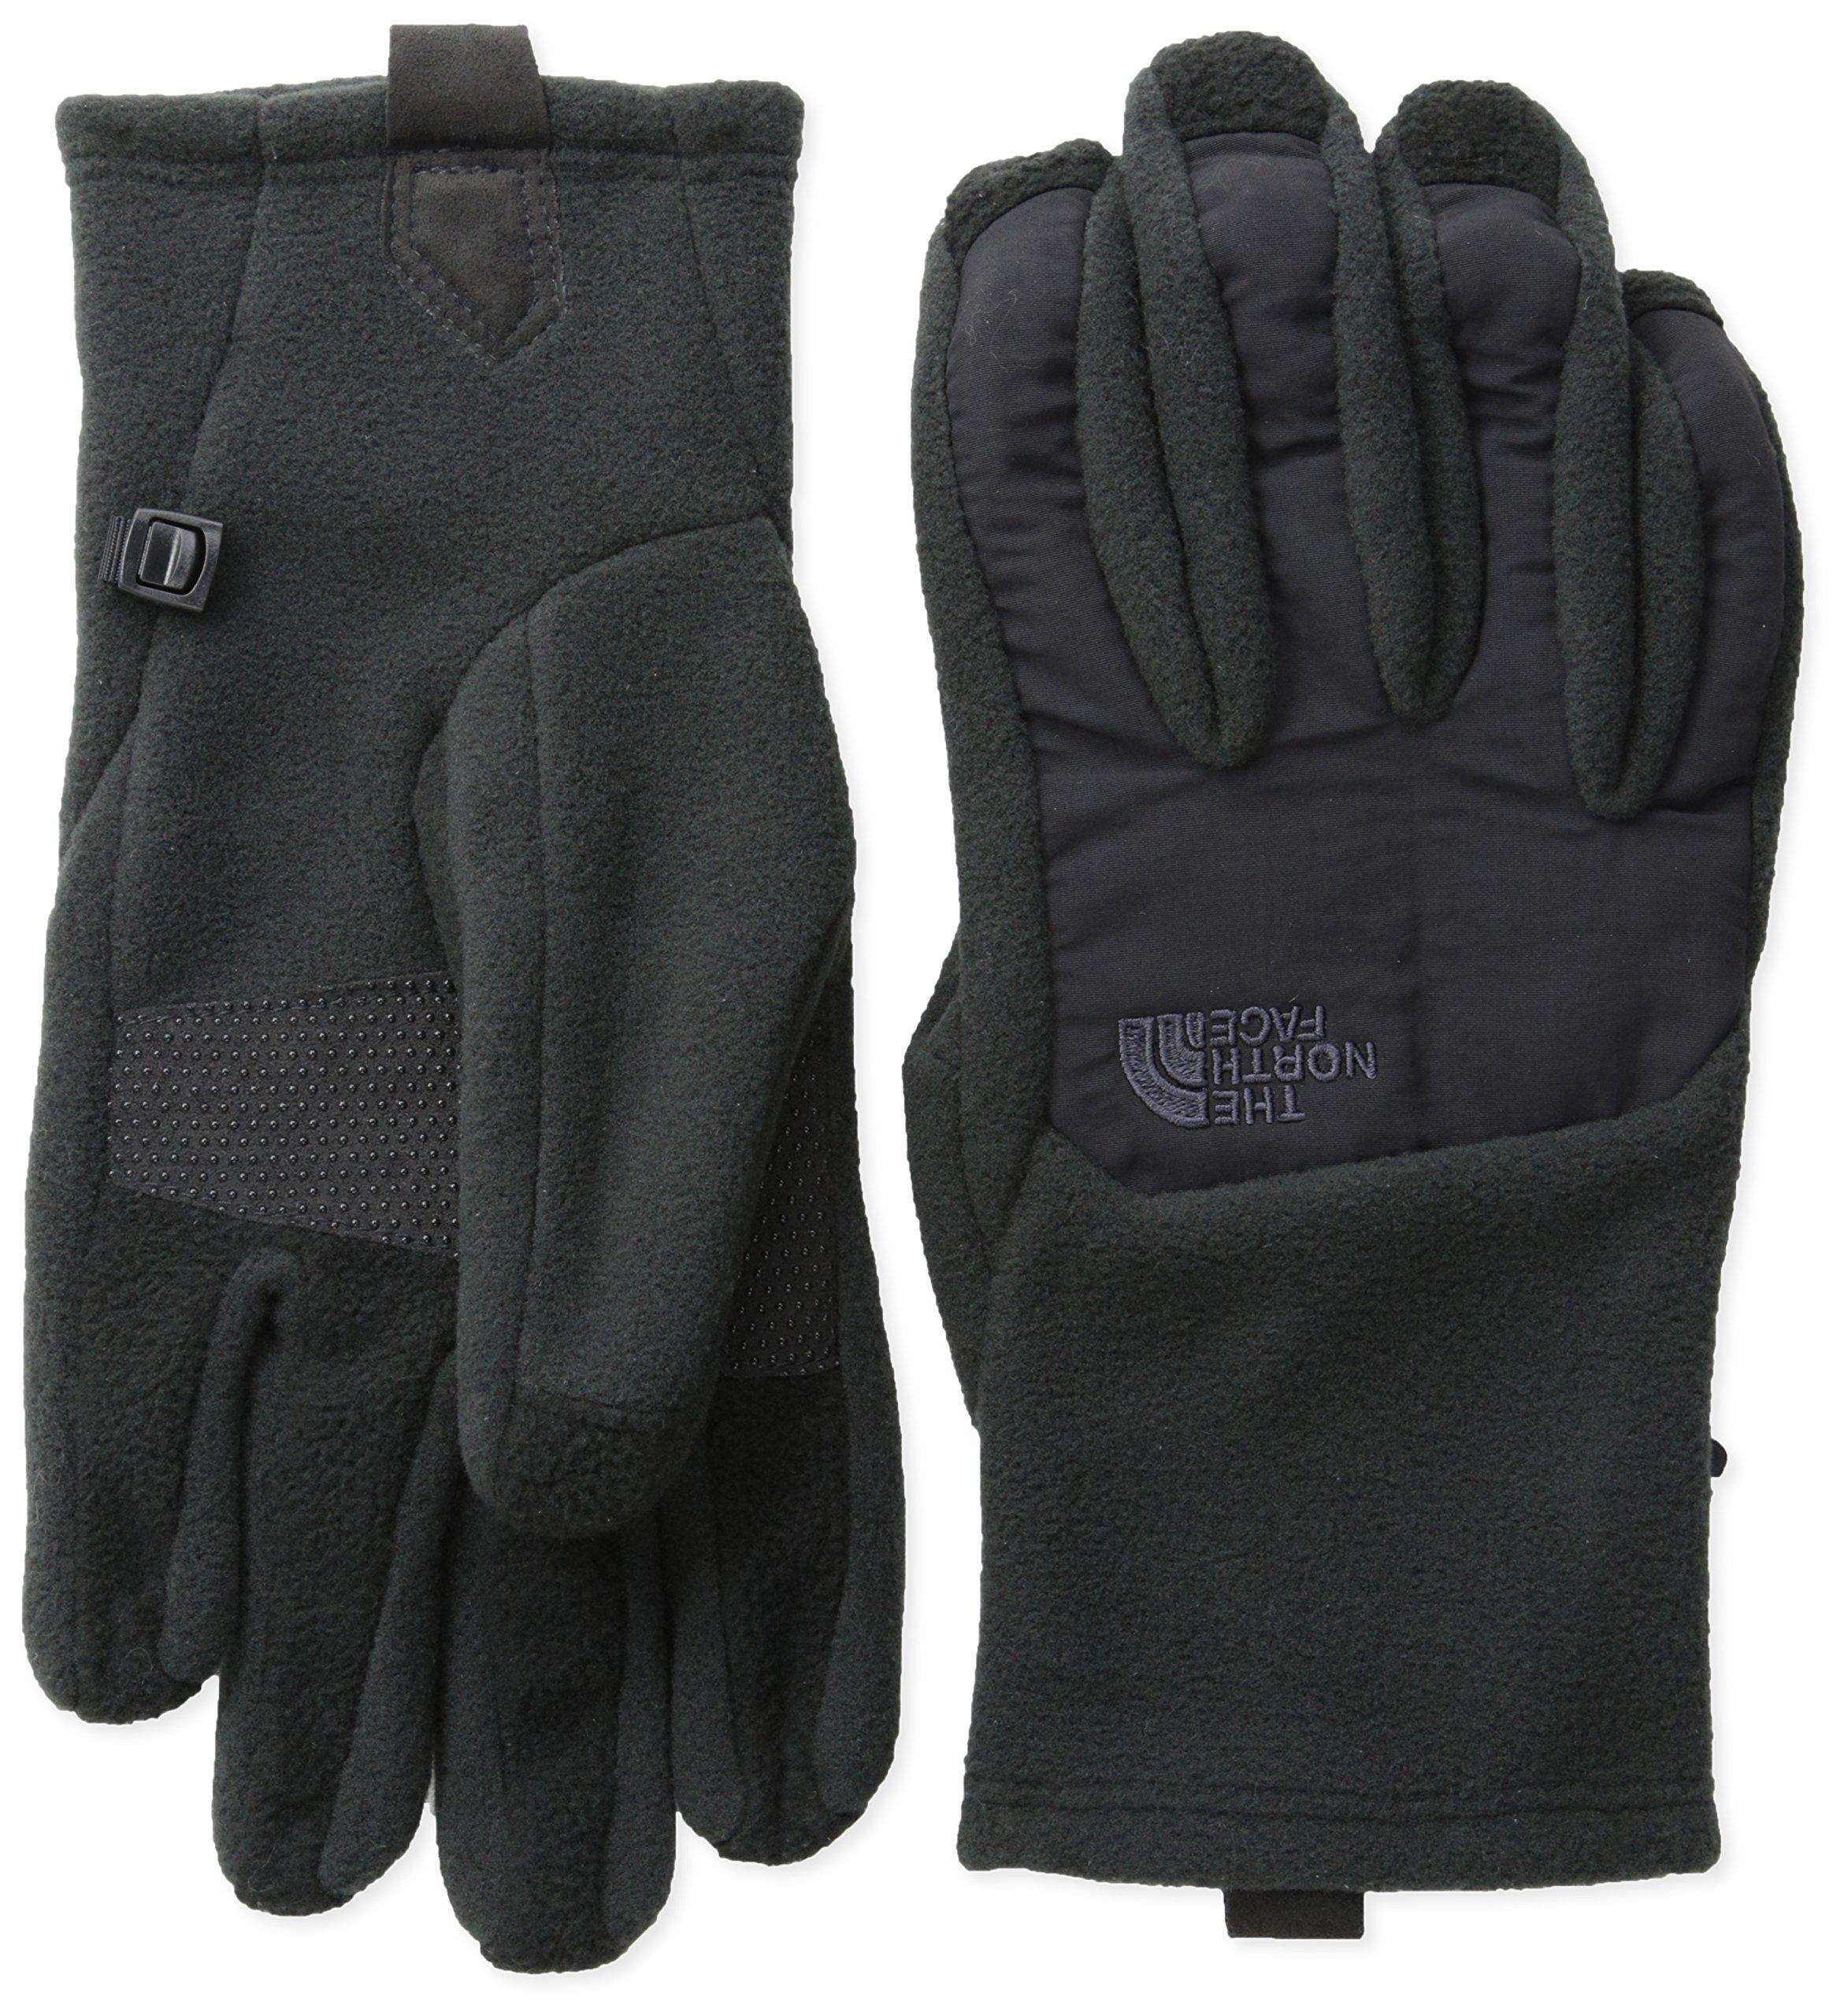 The North Face Men's Men's Denali Etip Glove TNF Black MD